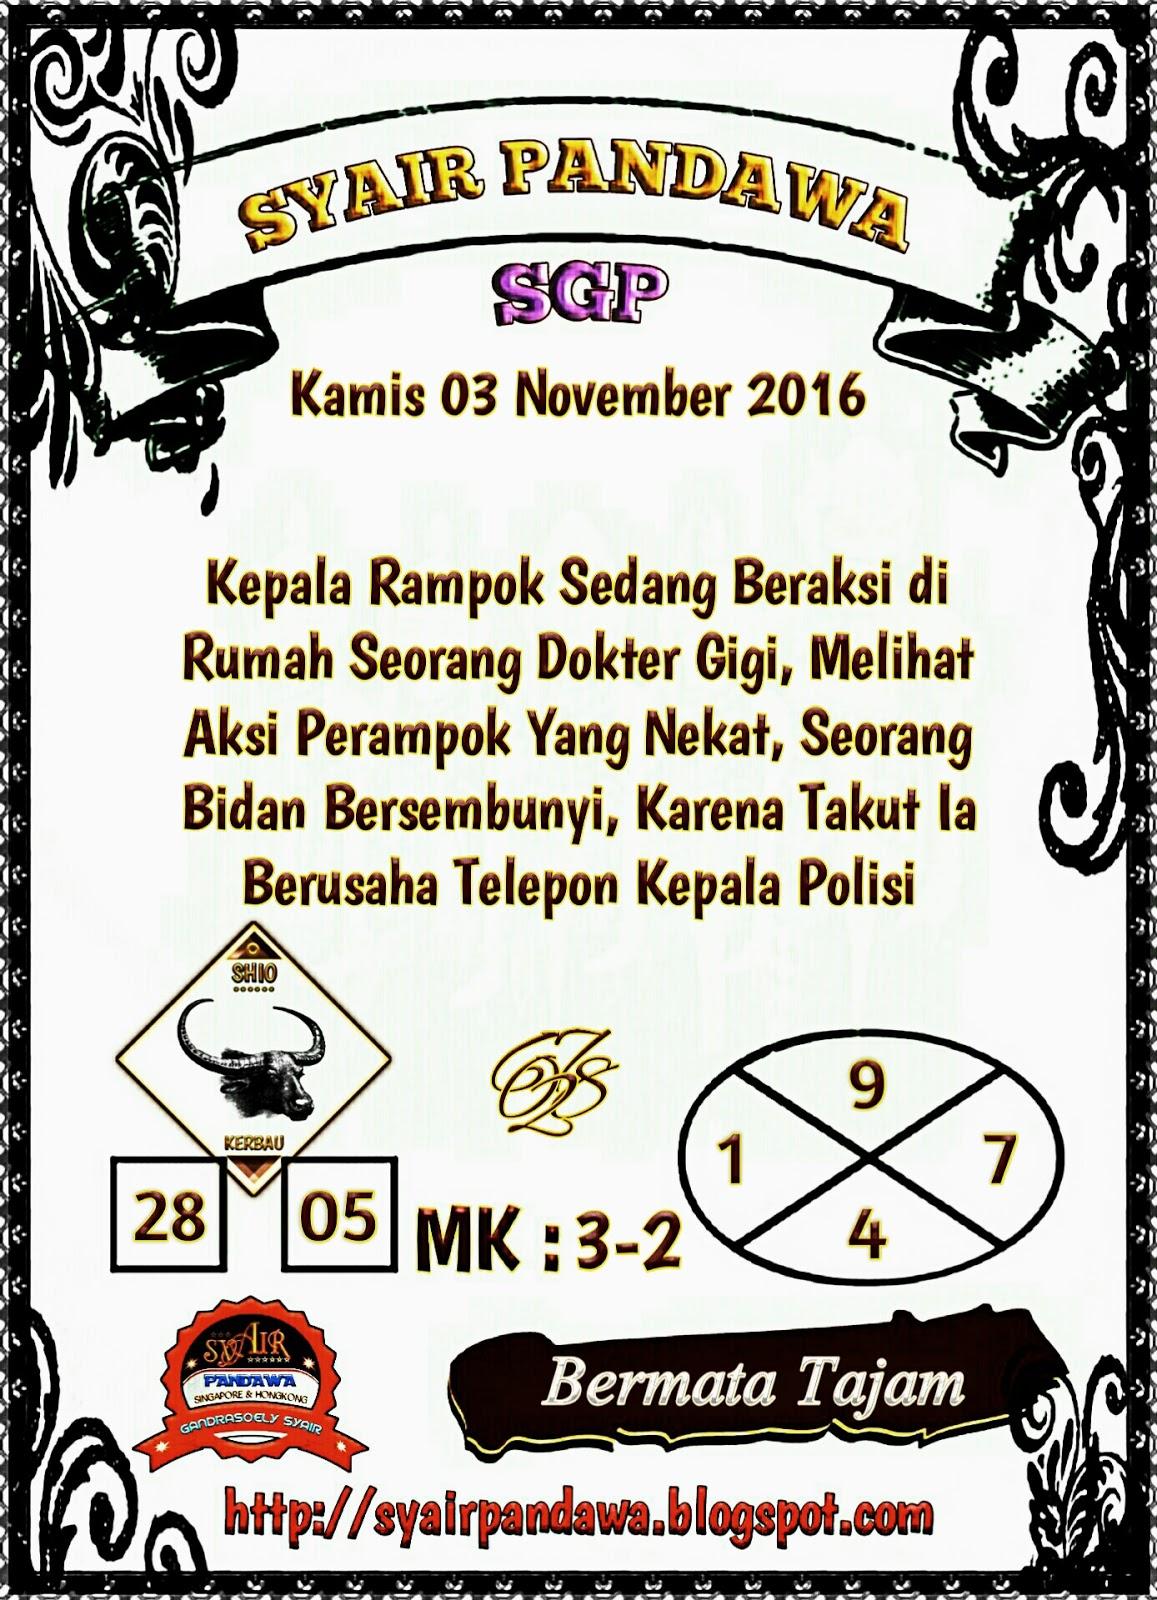 Syair Sgp Kamis 03 Nov 2016 Indowlatoto